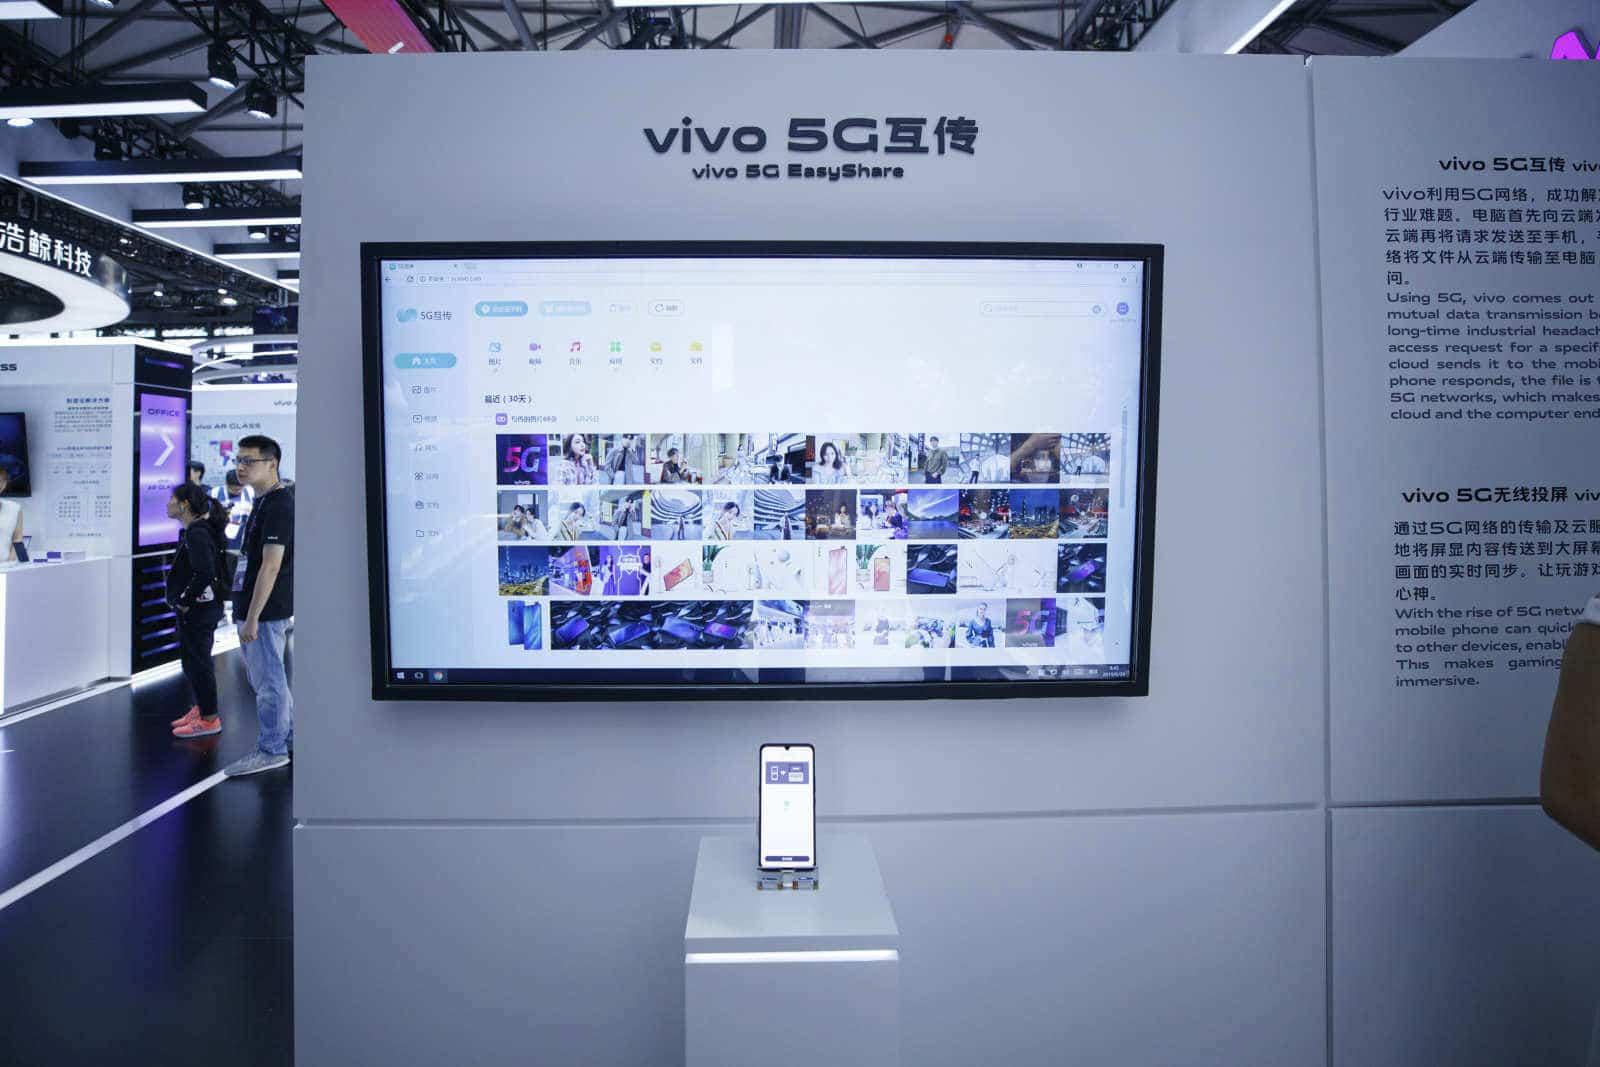 Vivo เผย พร้อมวางจำหน่ายมือถือ 5G รุ่นแรกช่วงไตรมาส 3 - Vivo เผย พร้อมวางจำหน่ายมือถือ 5G รุ่นแรกช่วงไตรมาส 3